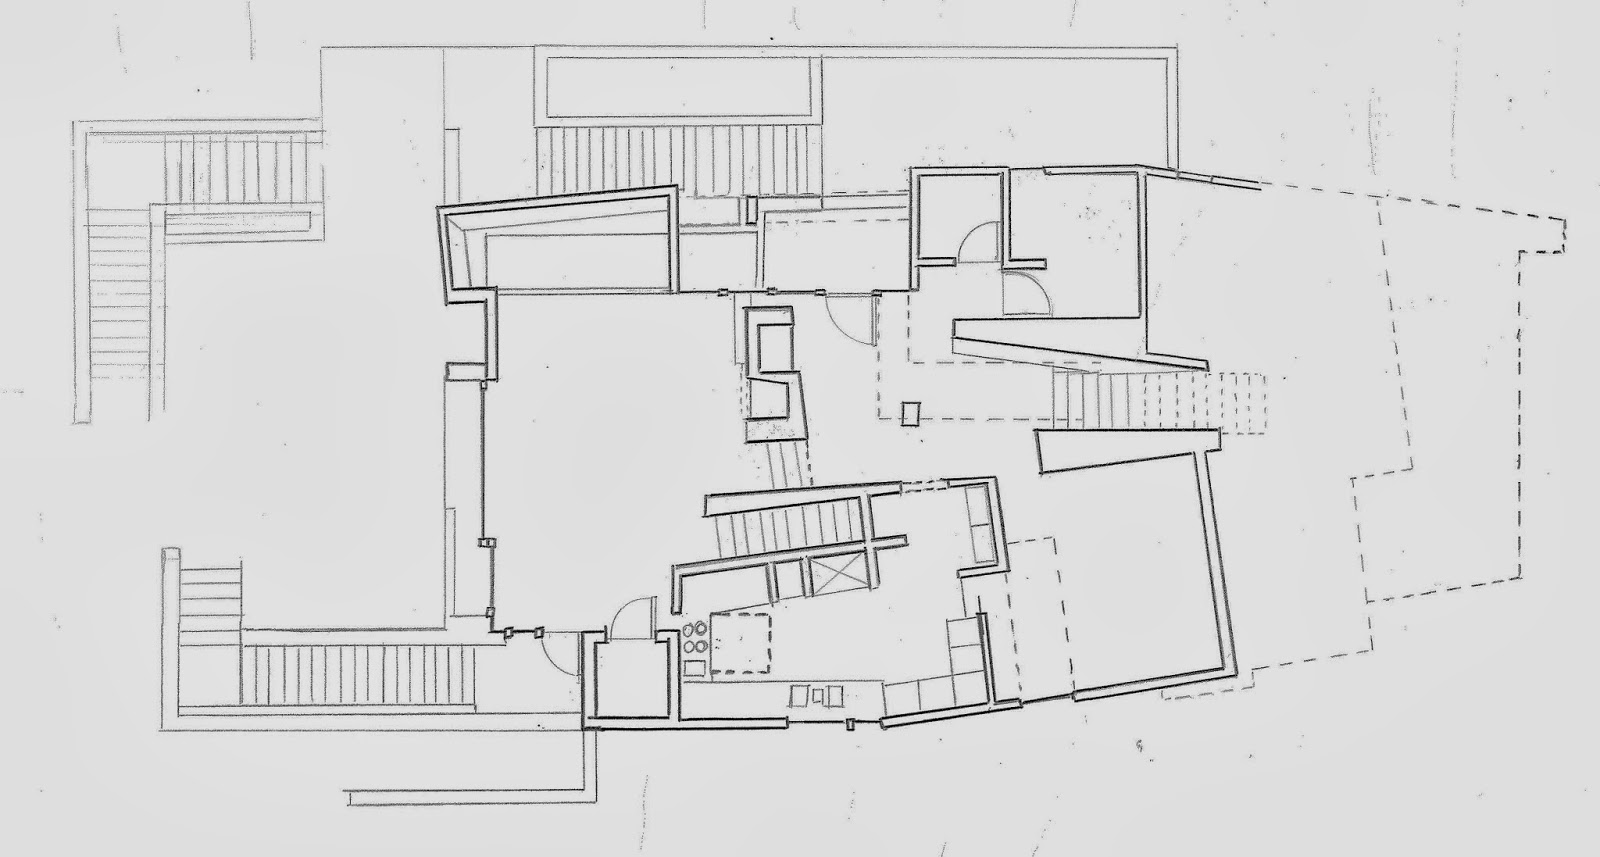 Arch 404 Graduate Design Studio I